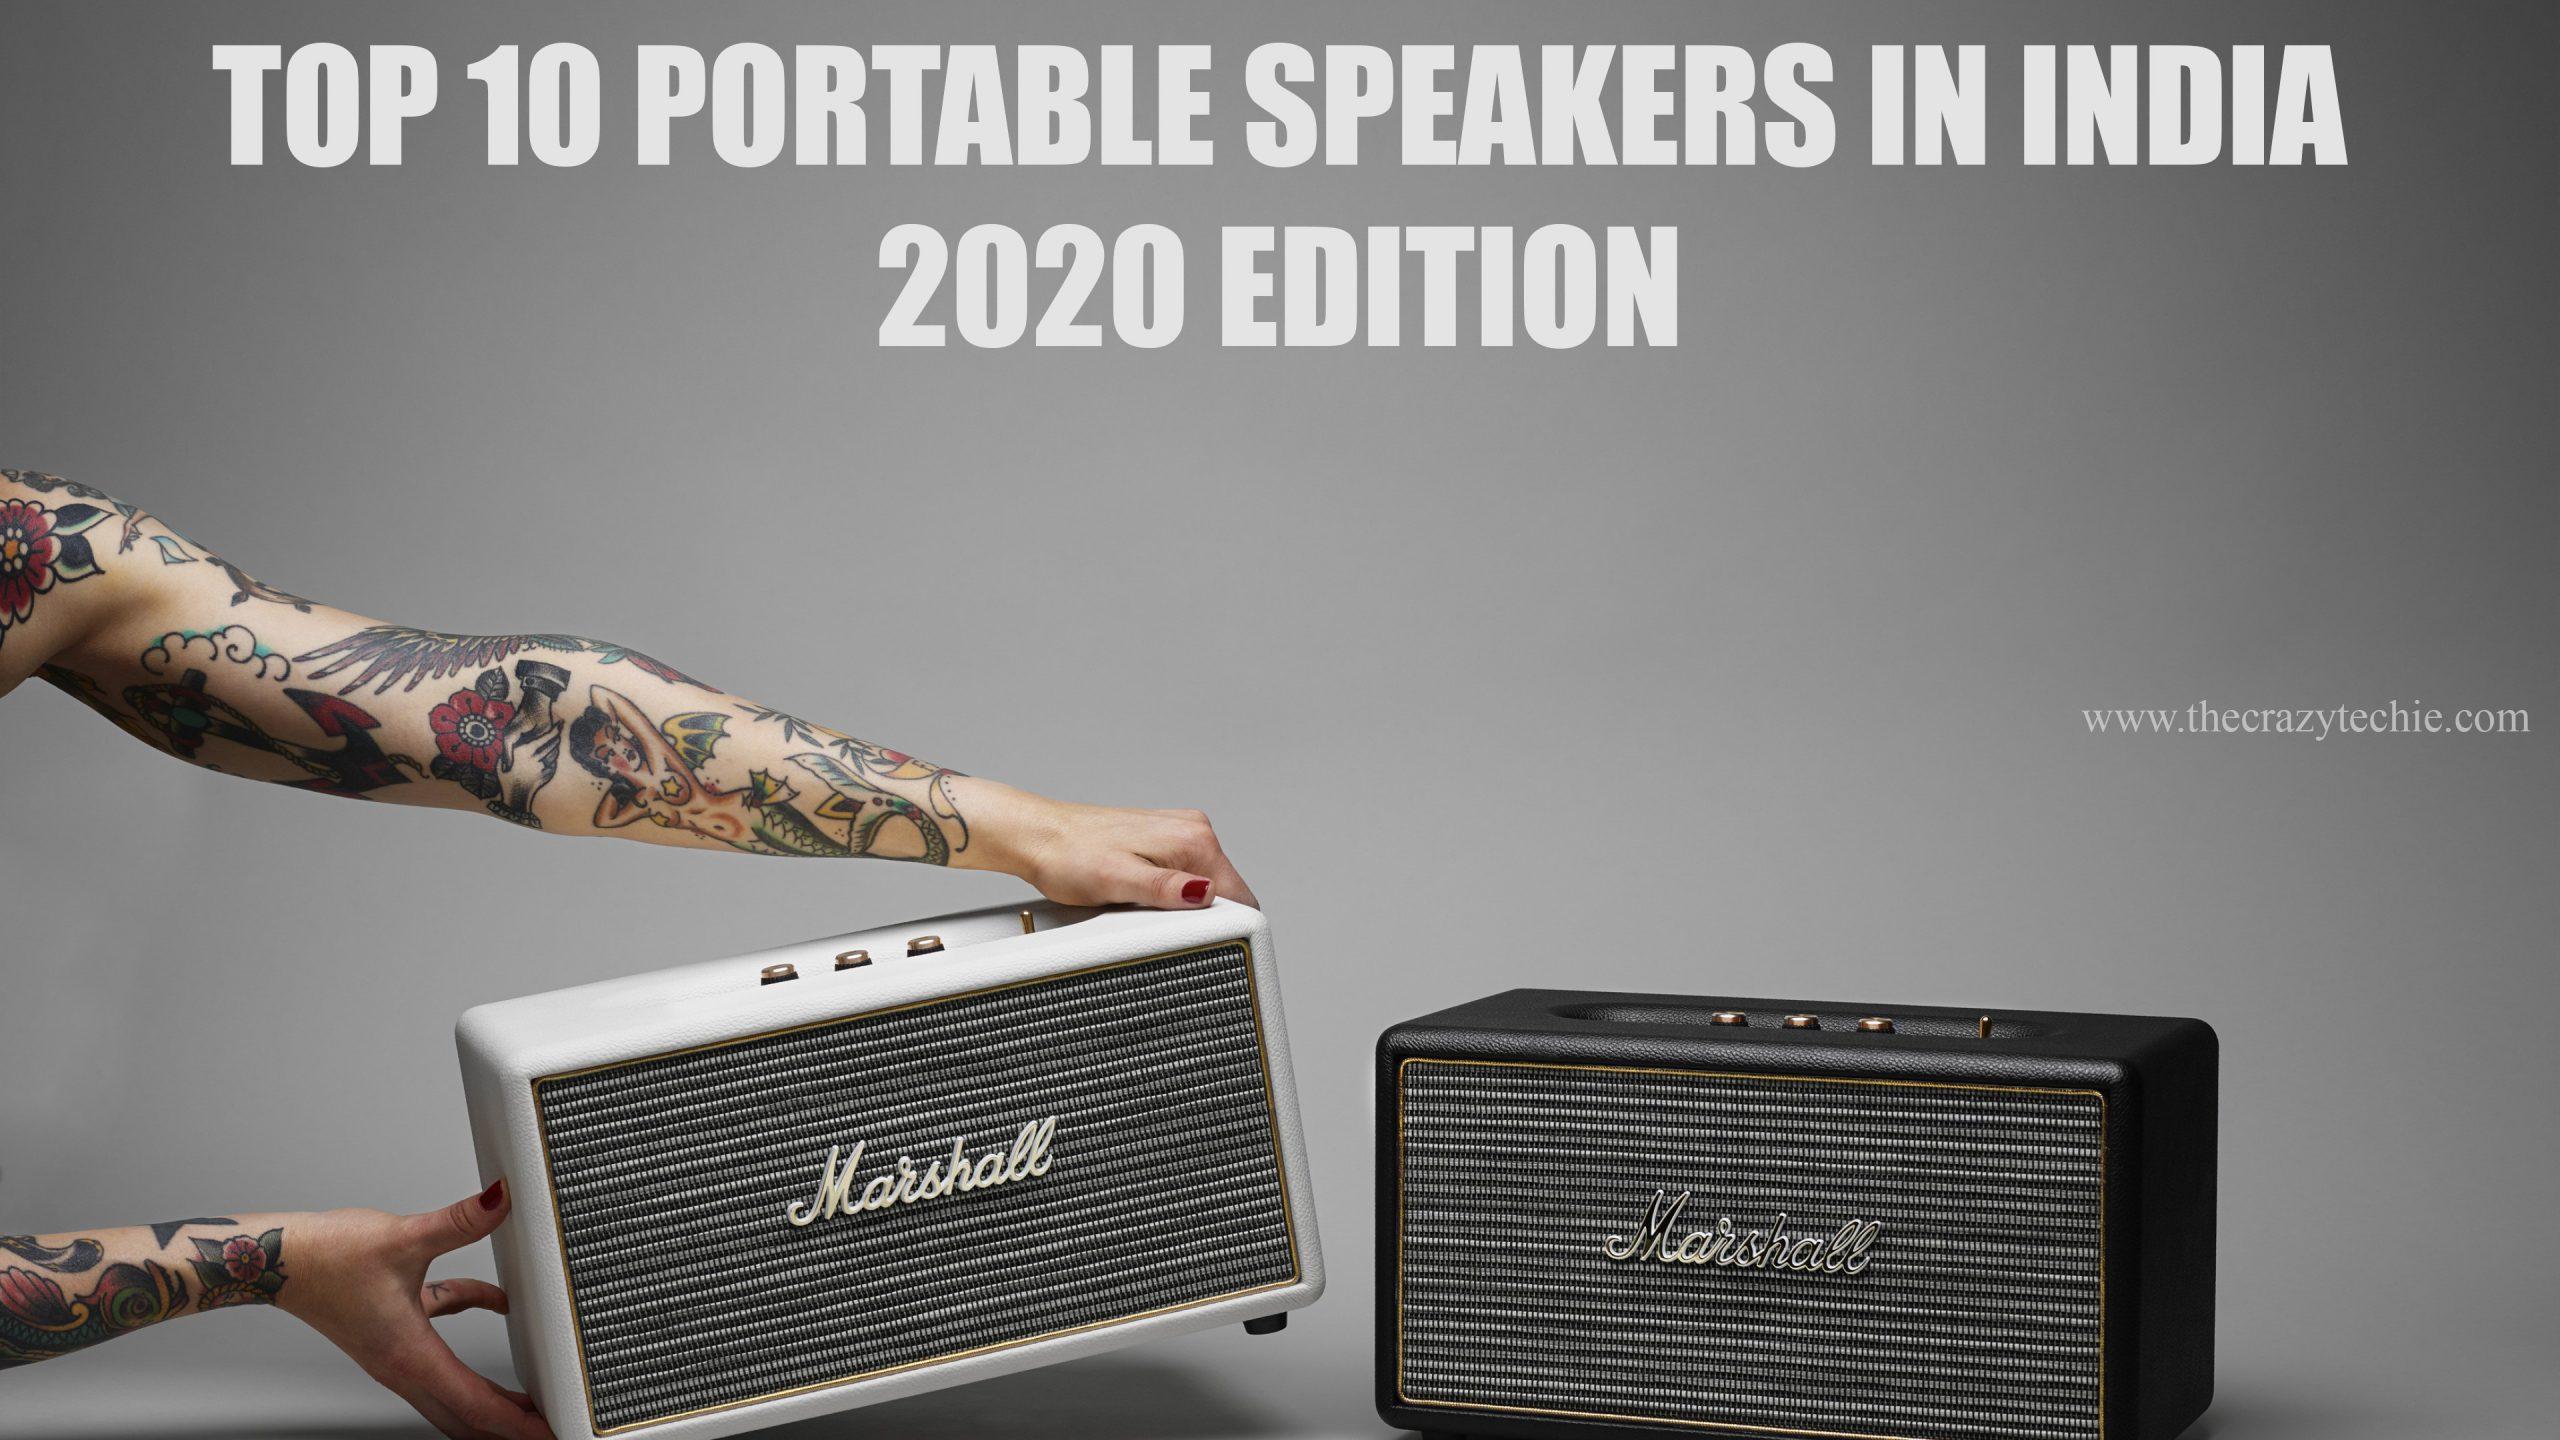 Best portable speakers in india list, Marshall bluetooth speakers